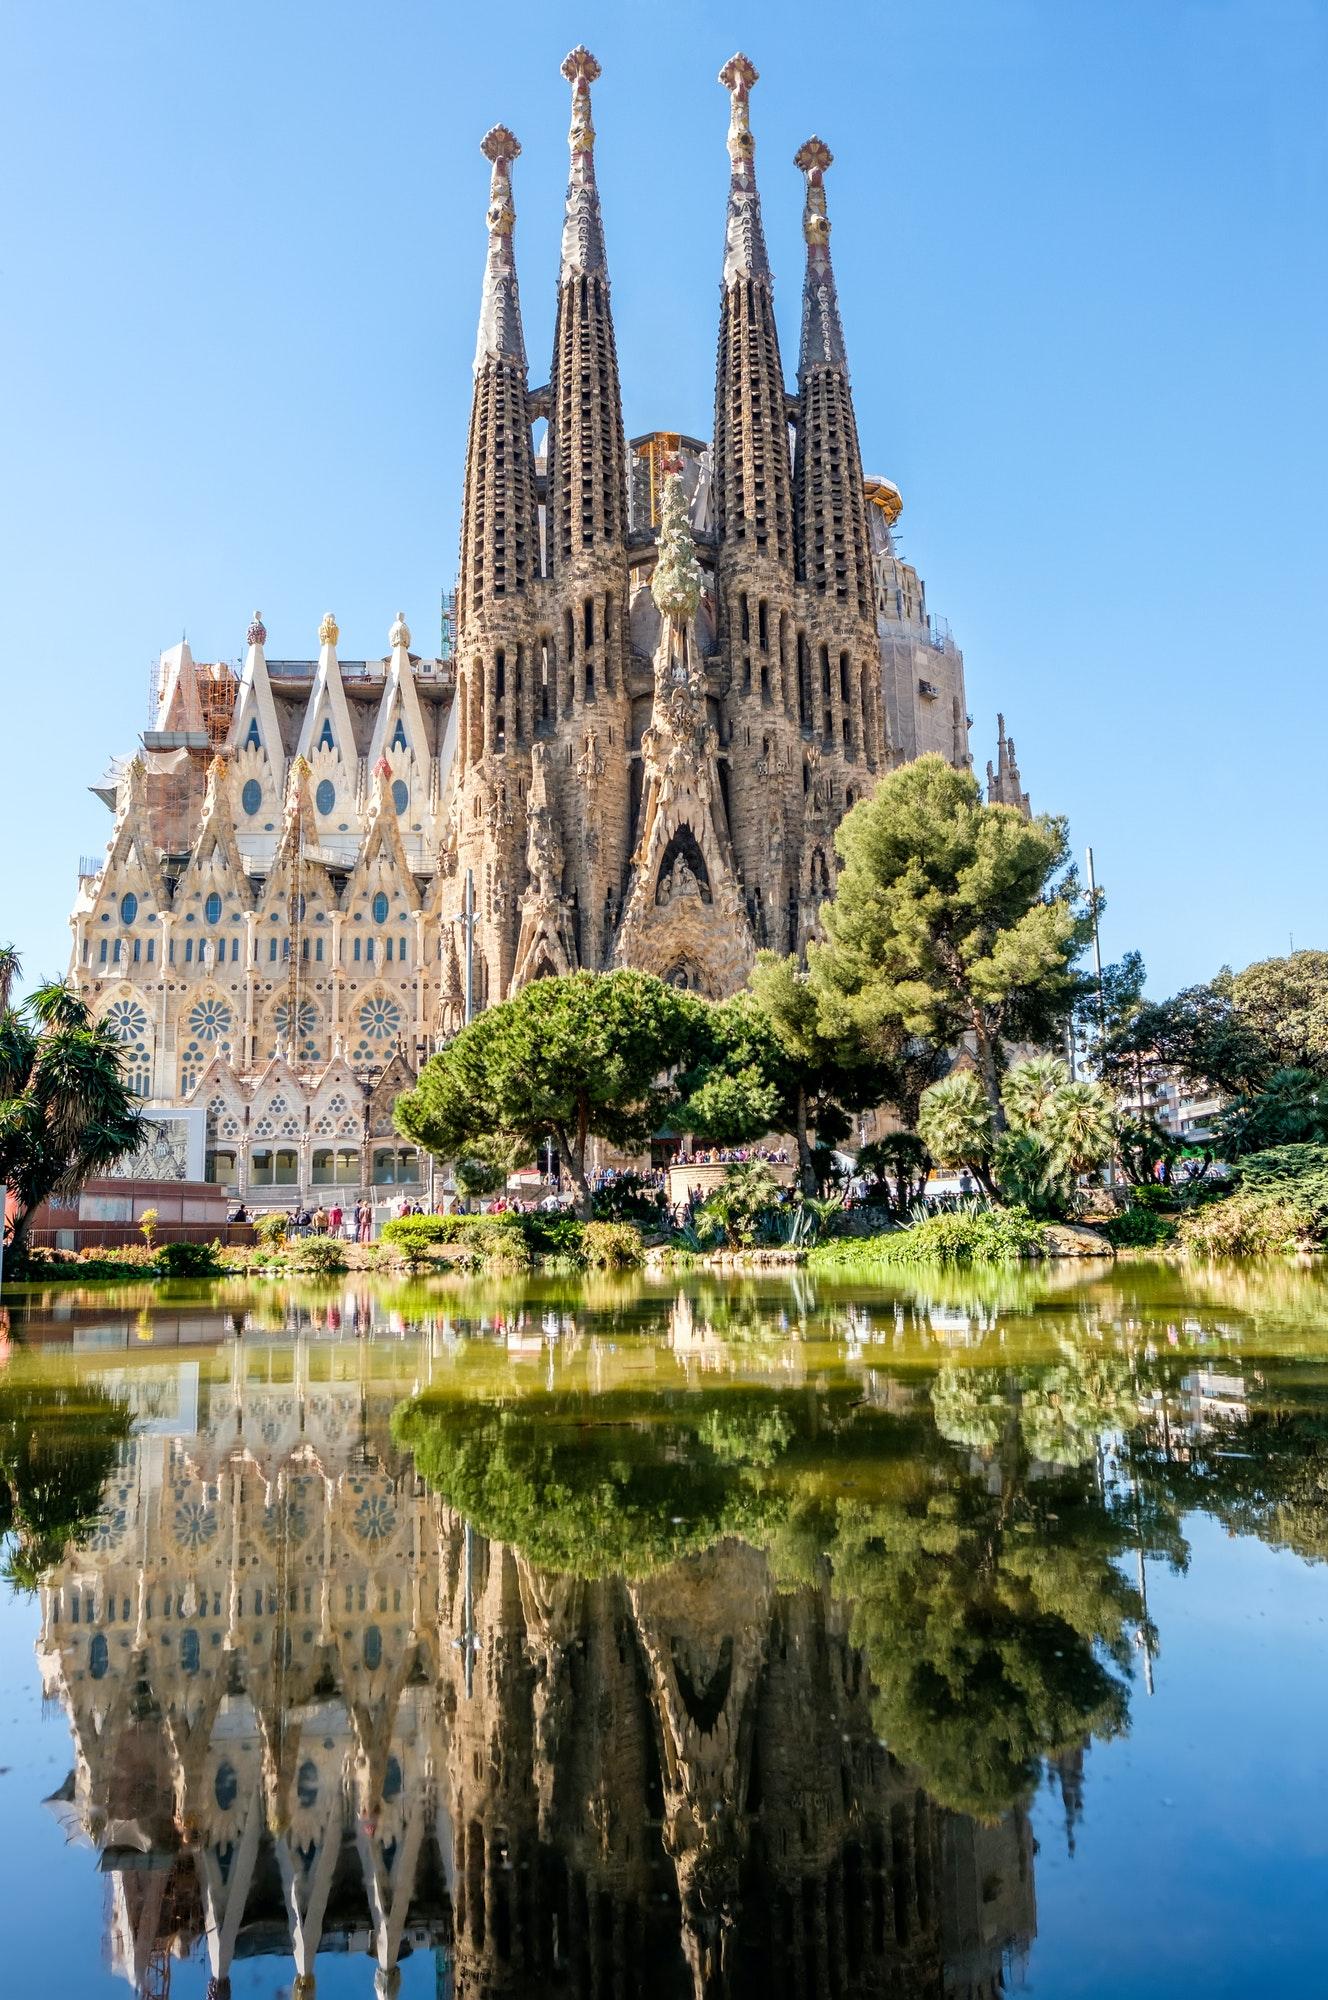 Sagrada Familia - Catholic church in Barcelona